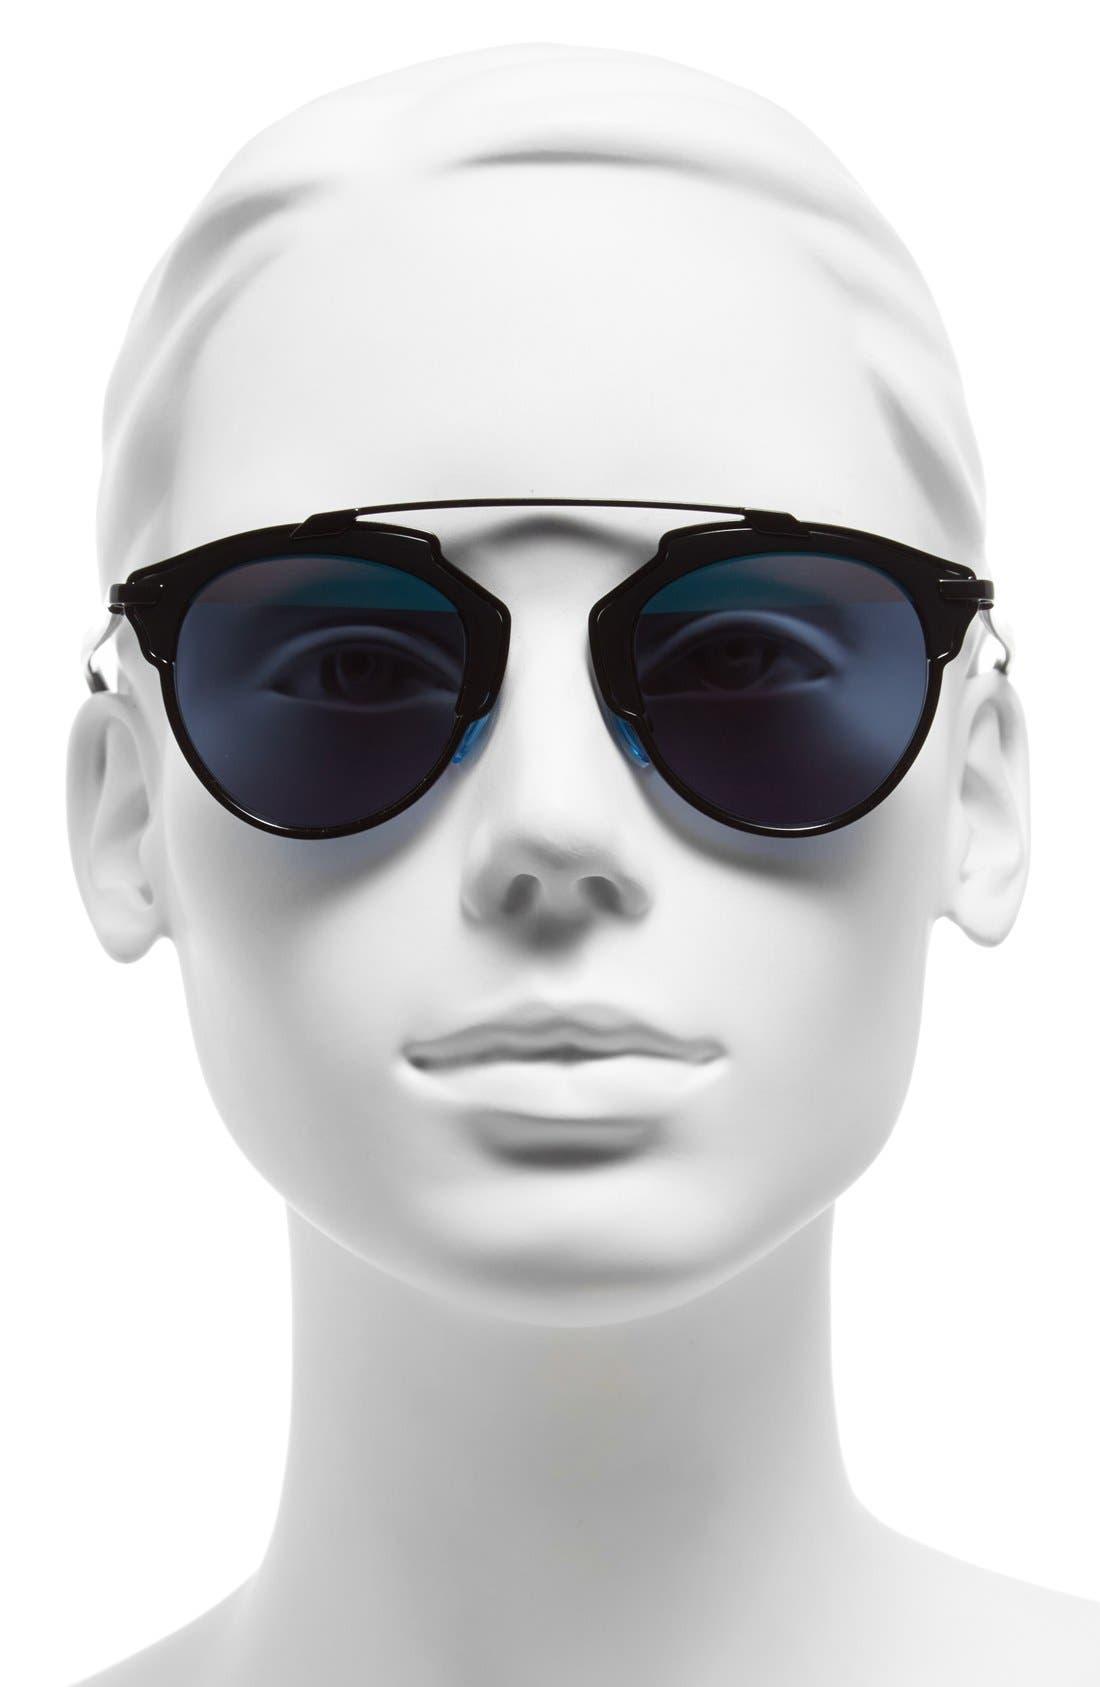 So Real 48mm Brow Bar Sunglasses,                             Alternate thumbnail 28, color,